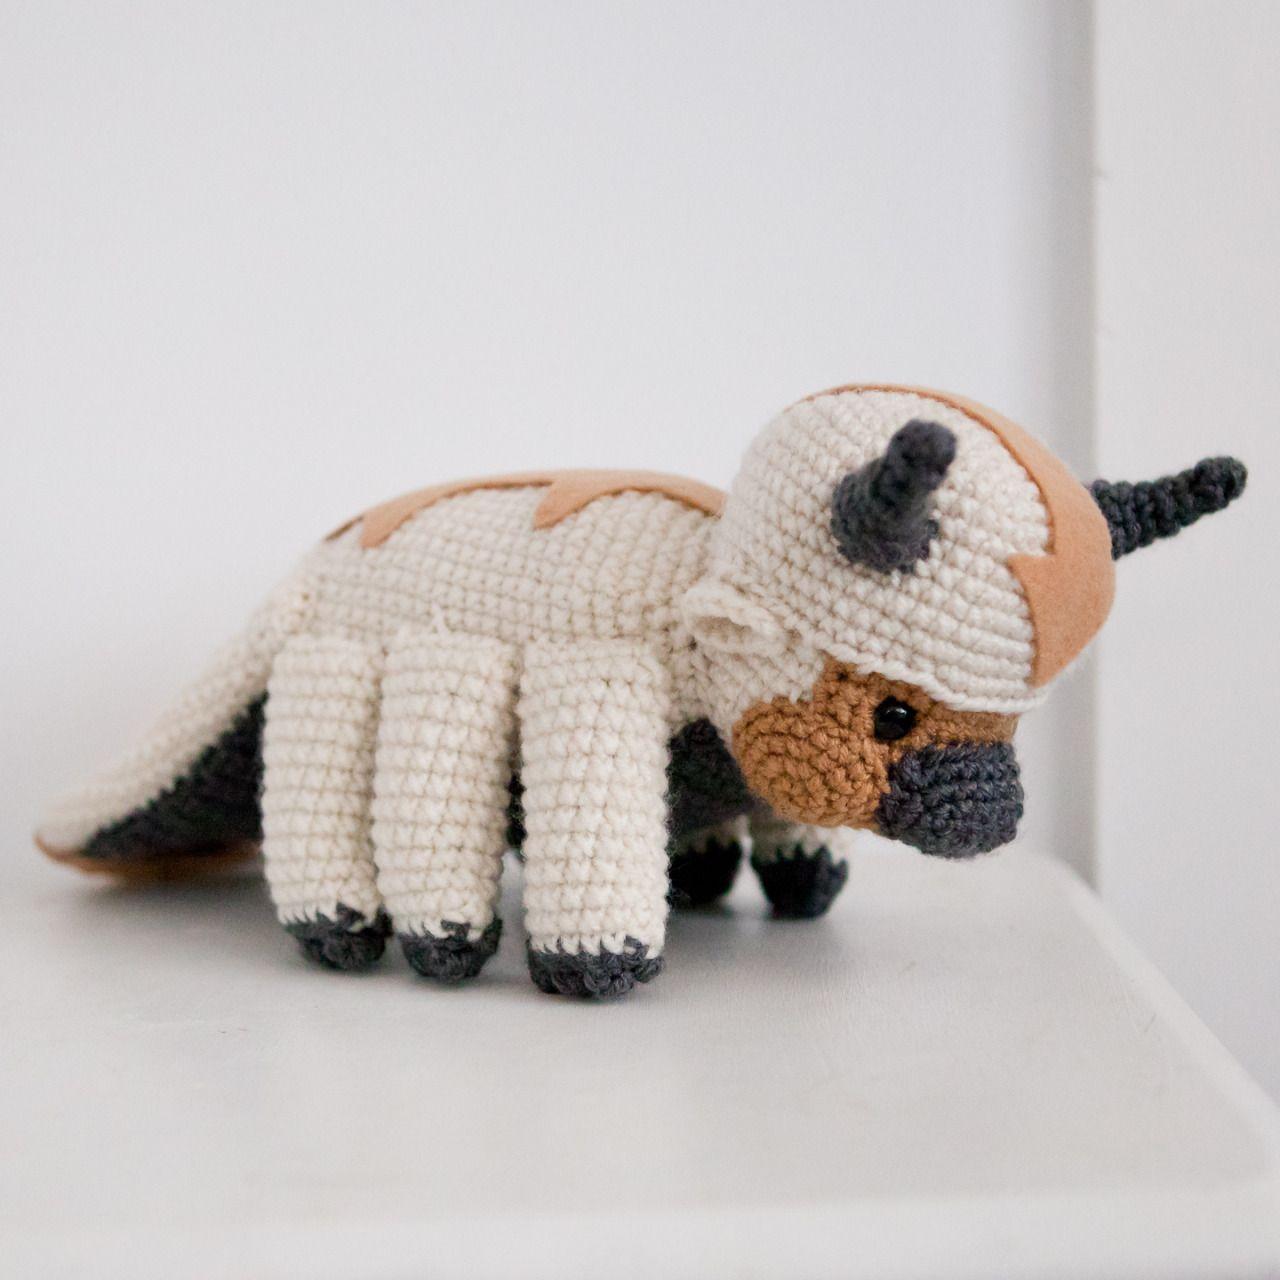 Amigurumi Crochet Appa, from Avatar the Last Airbender ...